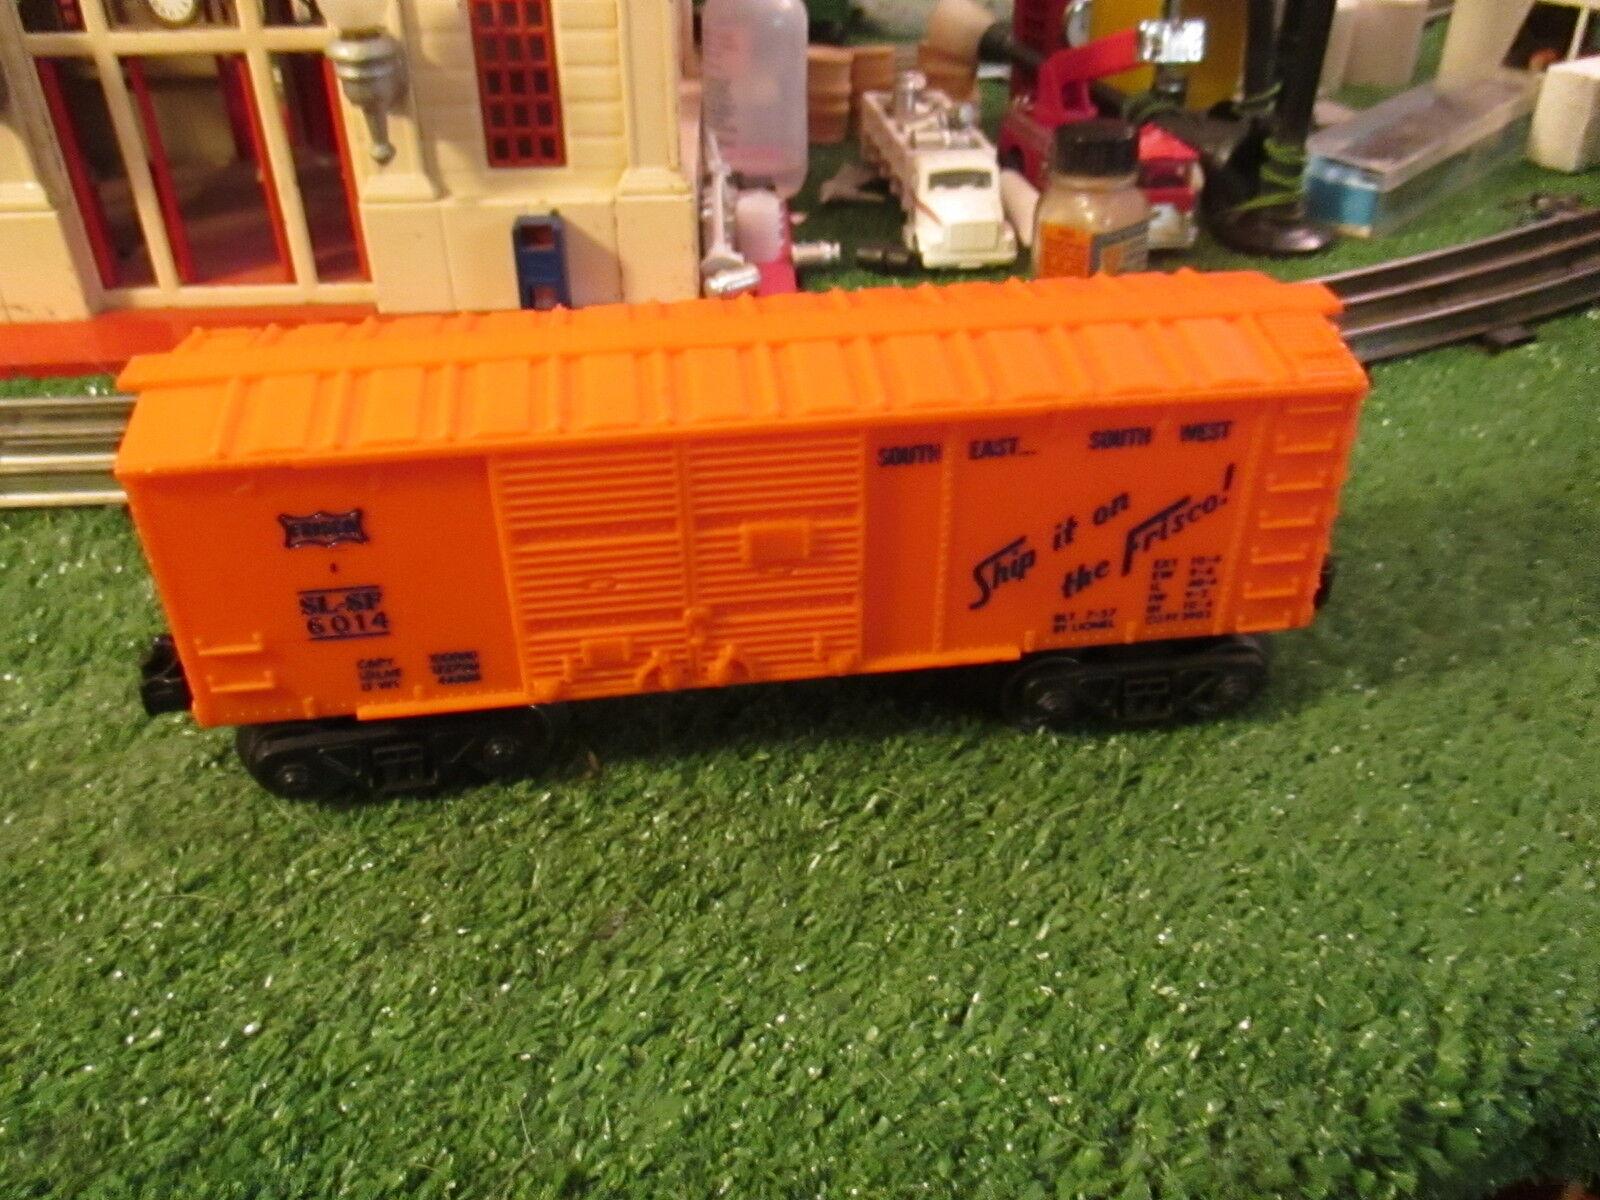 Nach dem krieg 6014 Orange frisco kurz lionel box car c8ln orig cond 1957 scharf